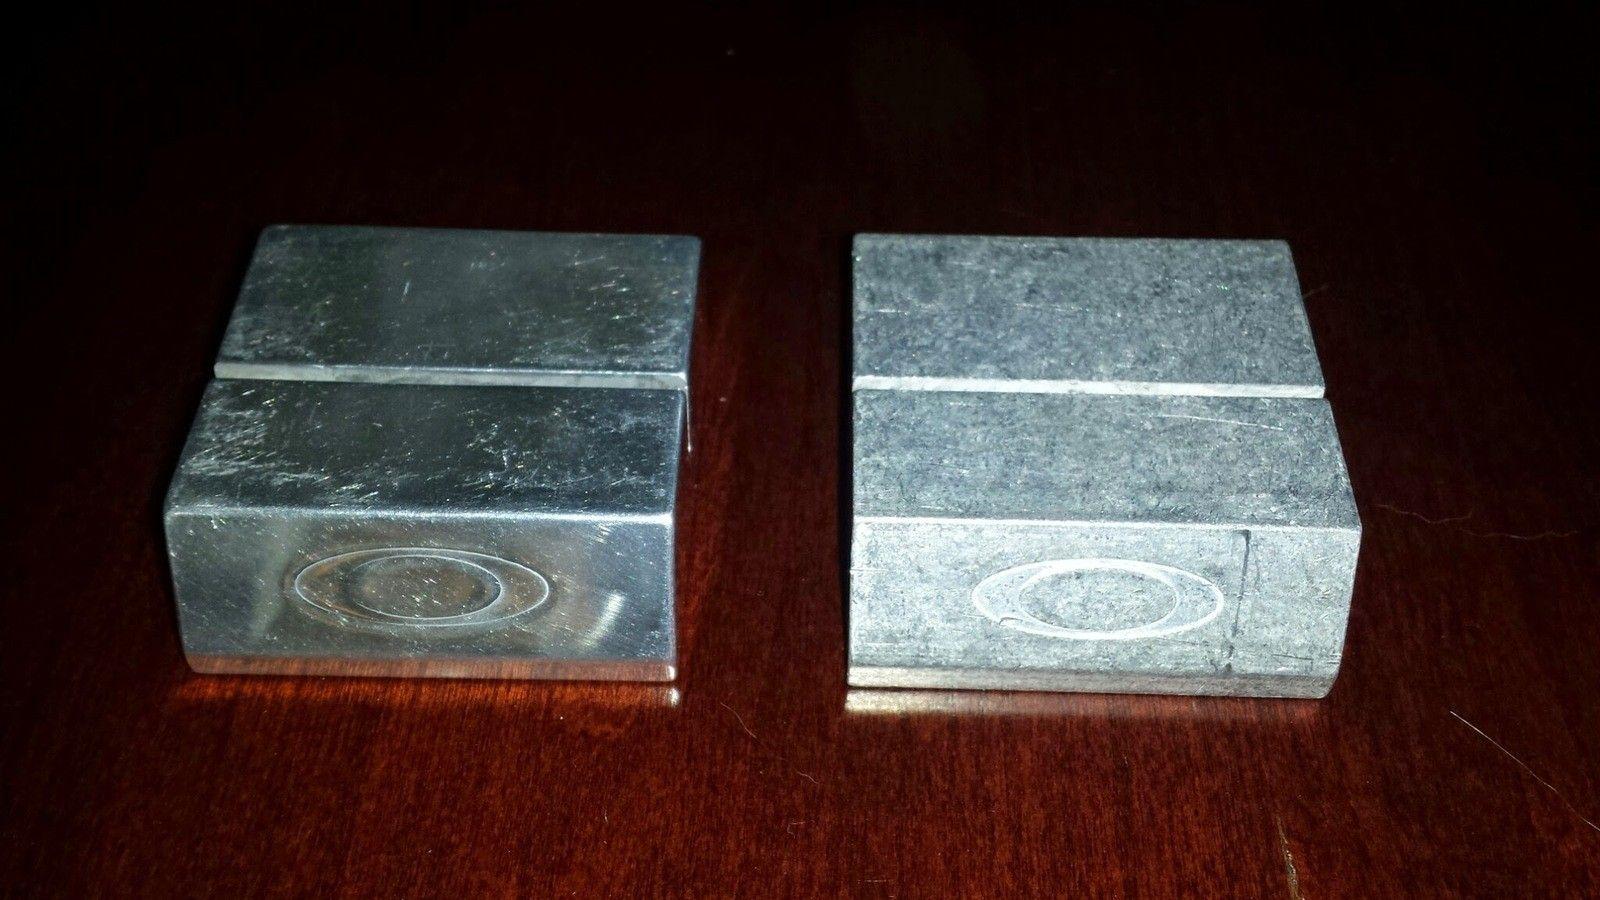 Chrome X-Metal Coin Holder - 20140508_191717.jpg